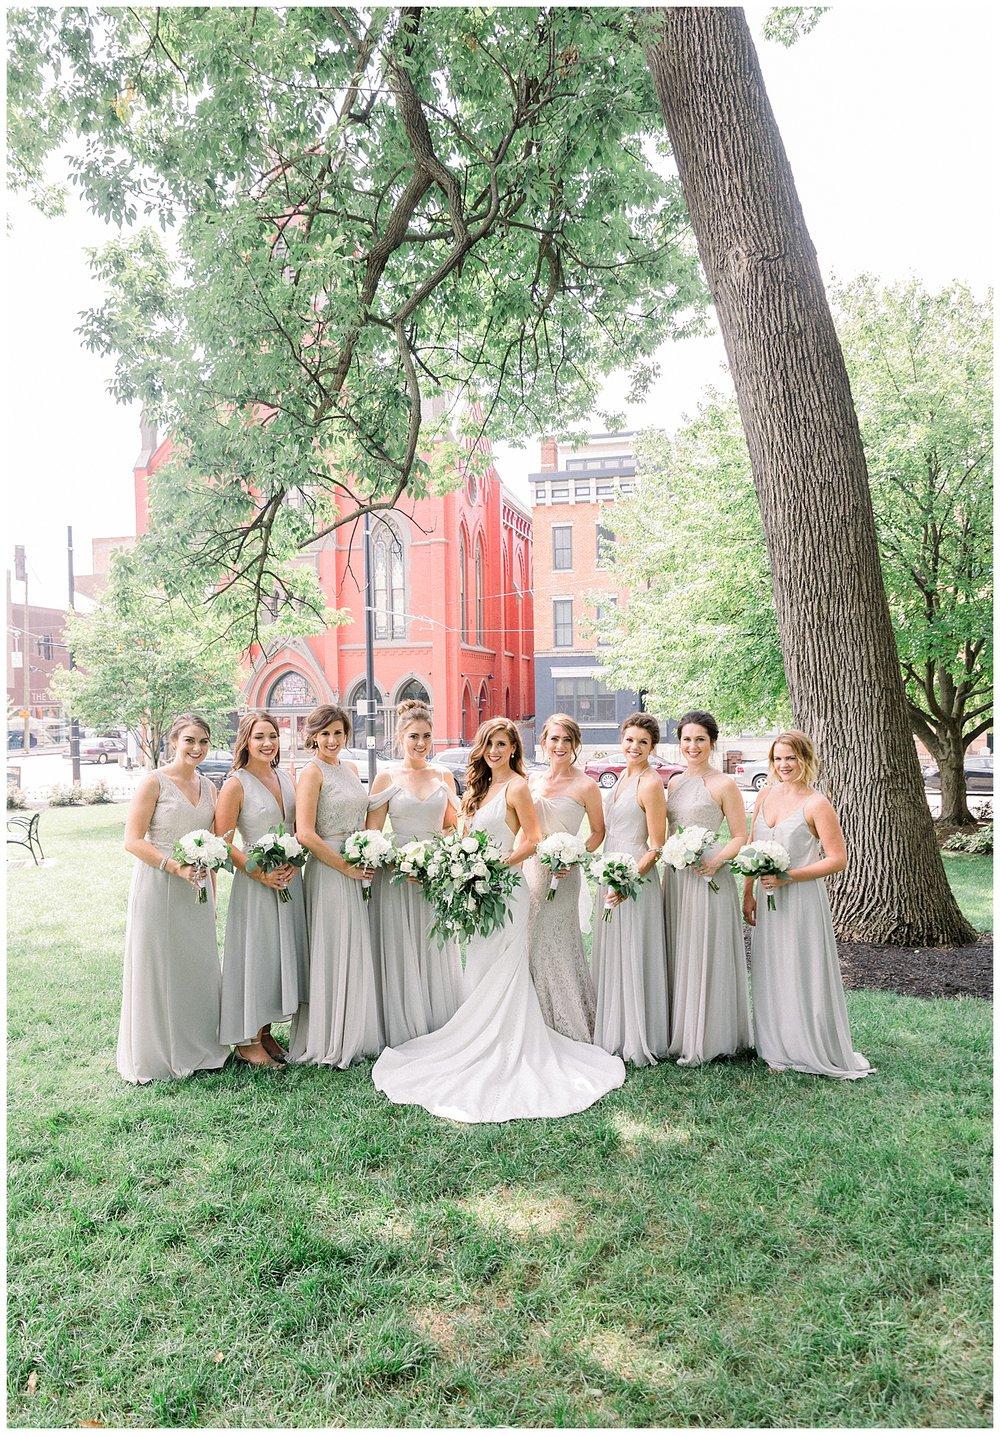 The Transept Cincinnati, OH Wedding Venue Ji Cherir Photography cincinnati wedding photographer  fine art film cincinnati wedding photographer washington park wedding